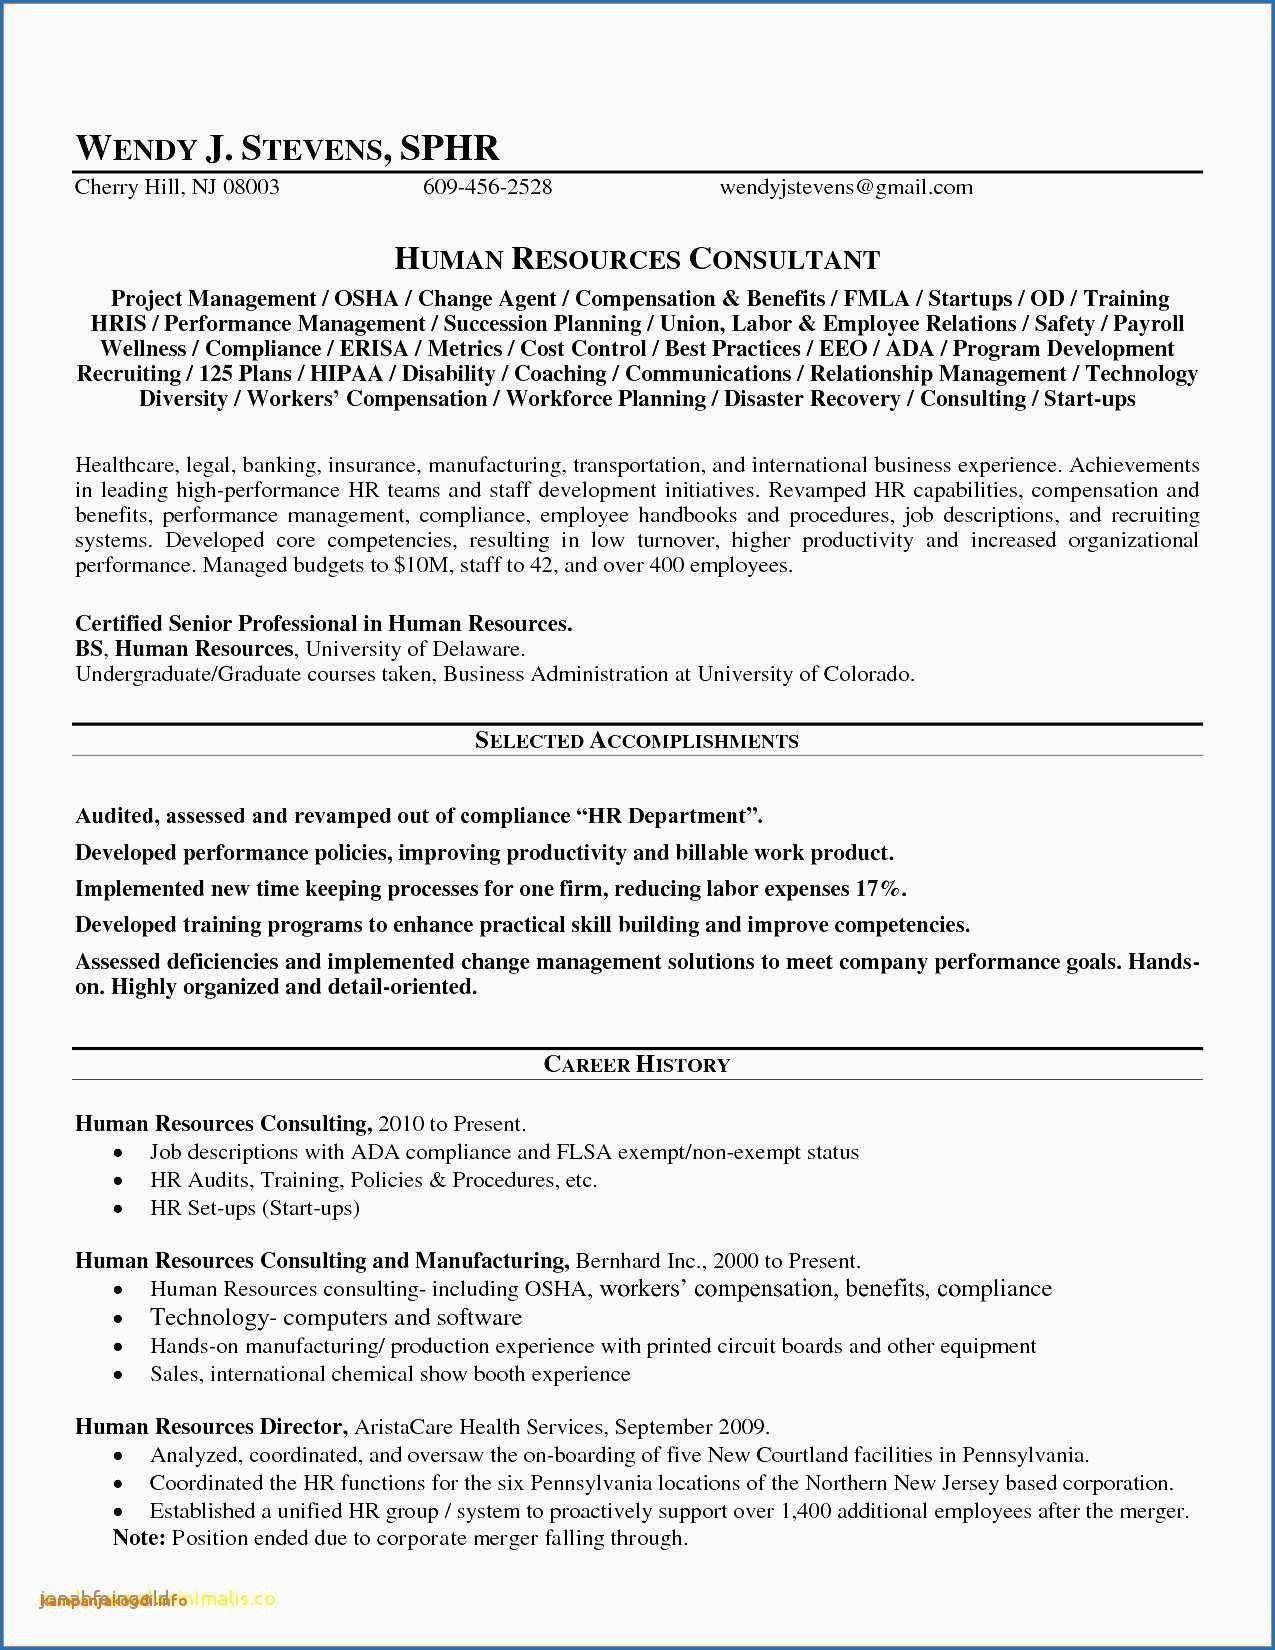 Medical Device Sales Resume Best Of Pin Oleh Steve Moccila Di Resume Templates Resume Skills Human Resources Human Resources Resume